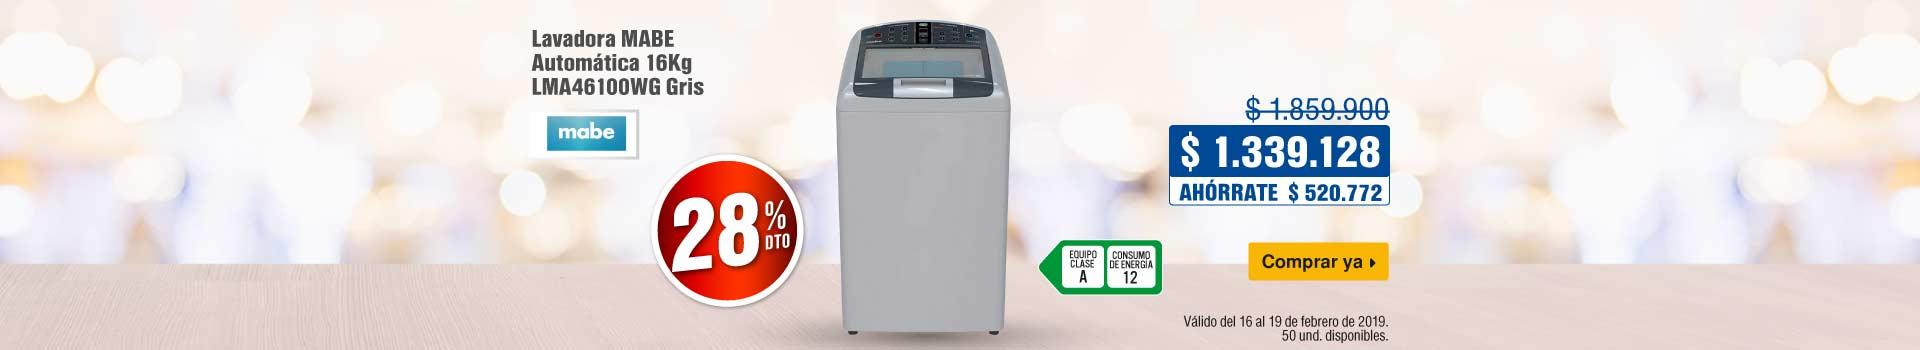 AK-KT-mayores-2-ELECT-BCAT-lavadoras-150219